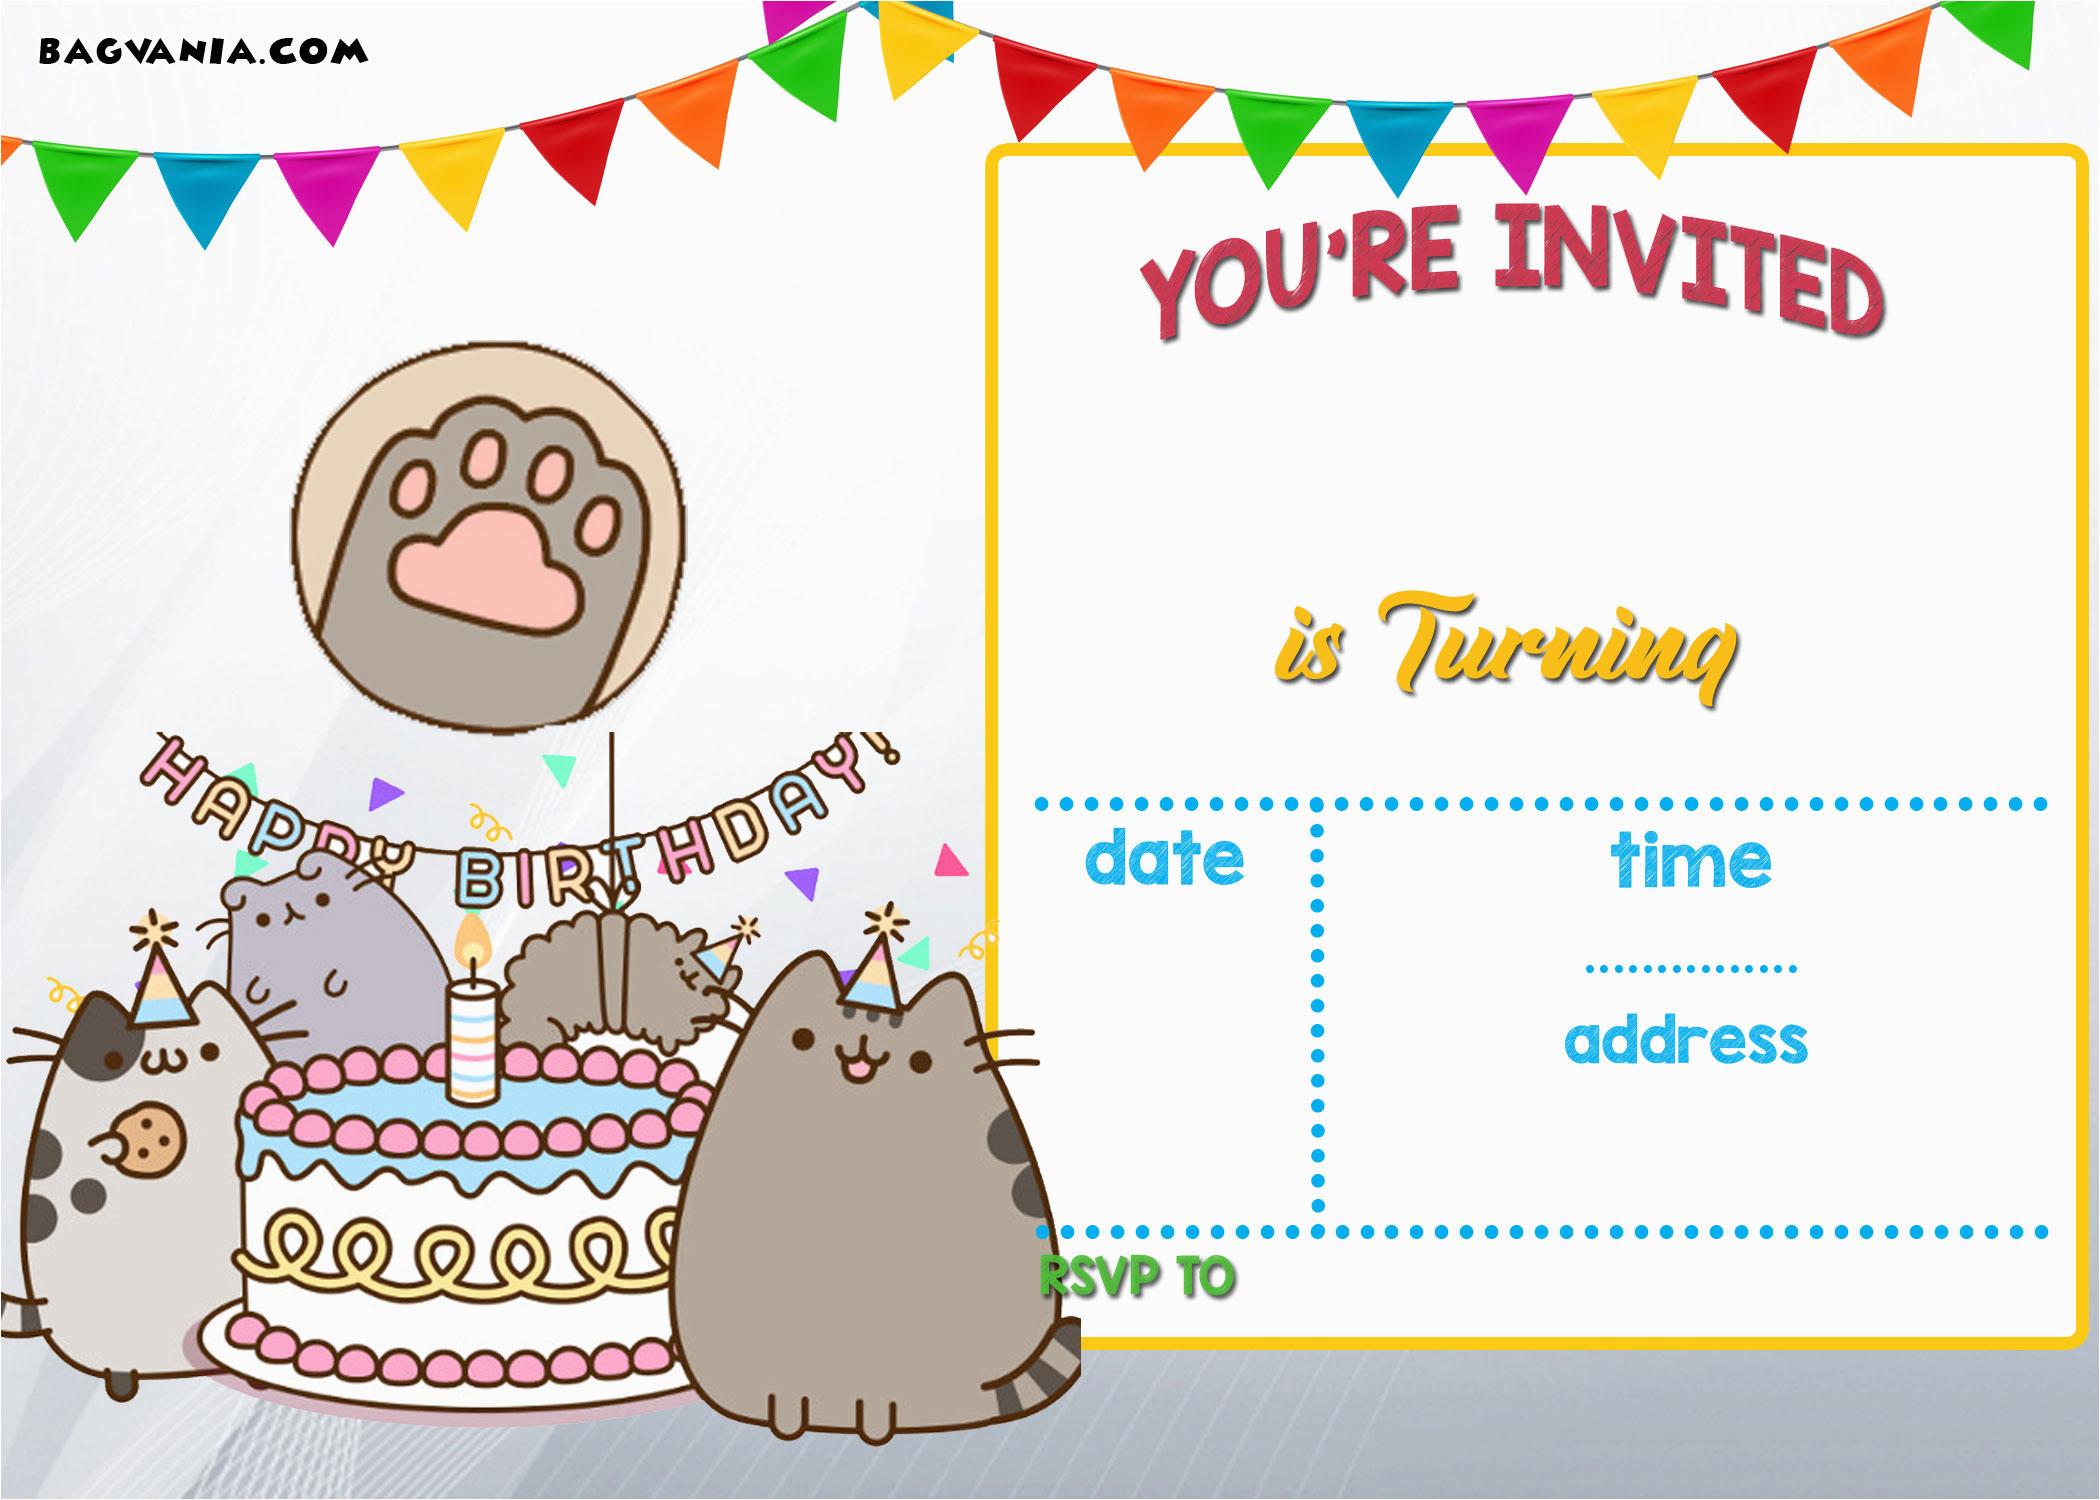 Pusheen Birthday Invitations | Birthdaybuzz - Free Printable Water Park Birthday Invitations